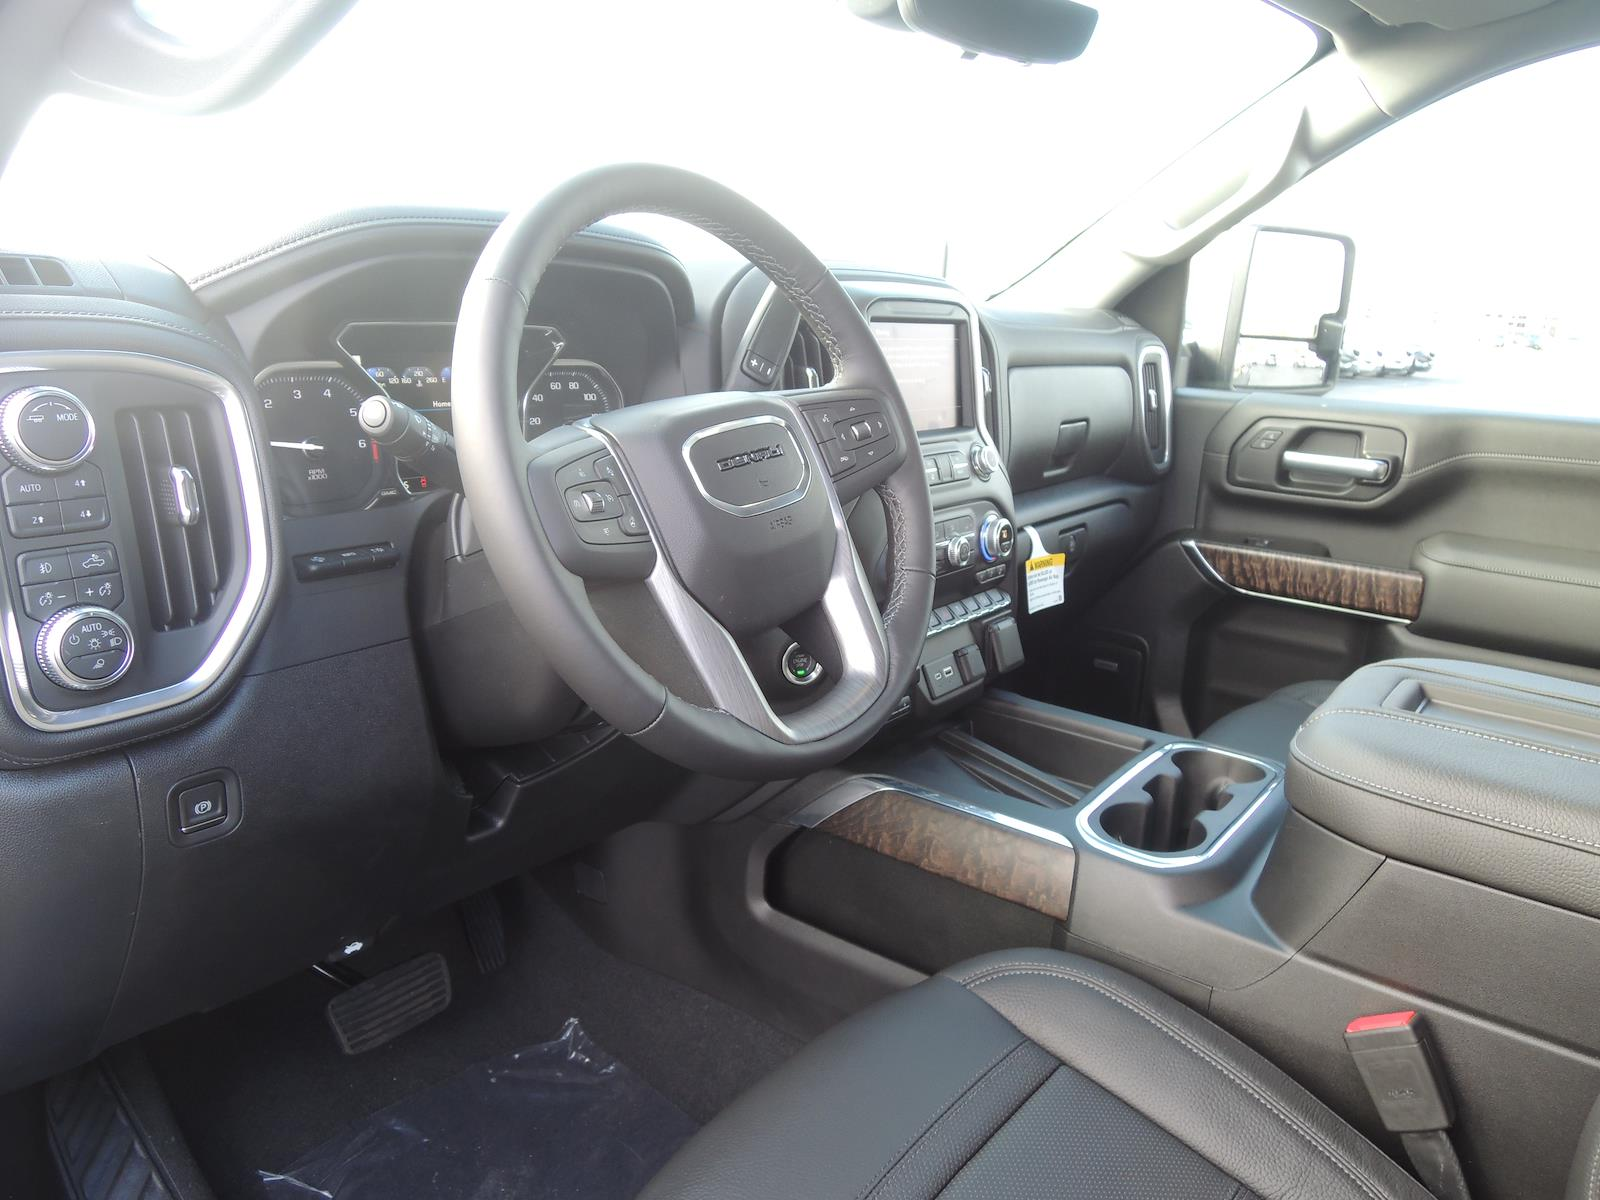 2021 GMC Sierra 2500 Crew Cab 4x4, Pickup #MT488 - photo 17